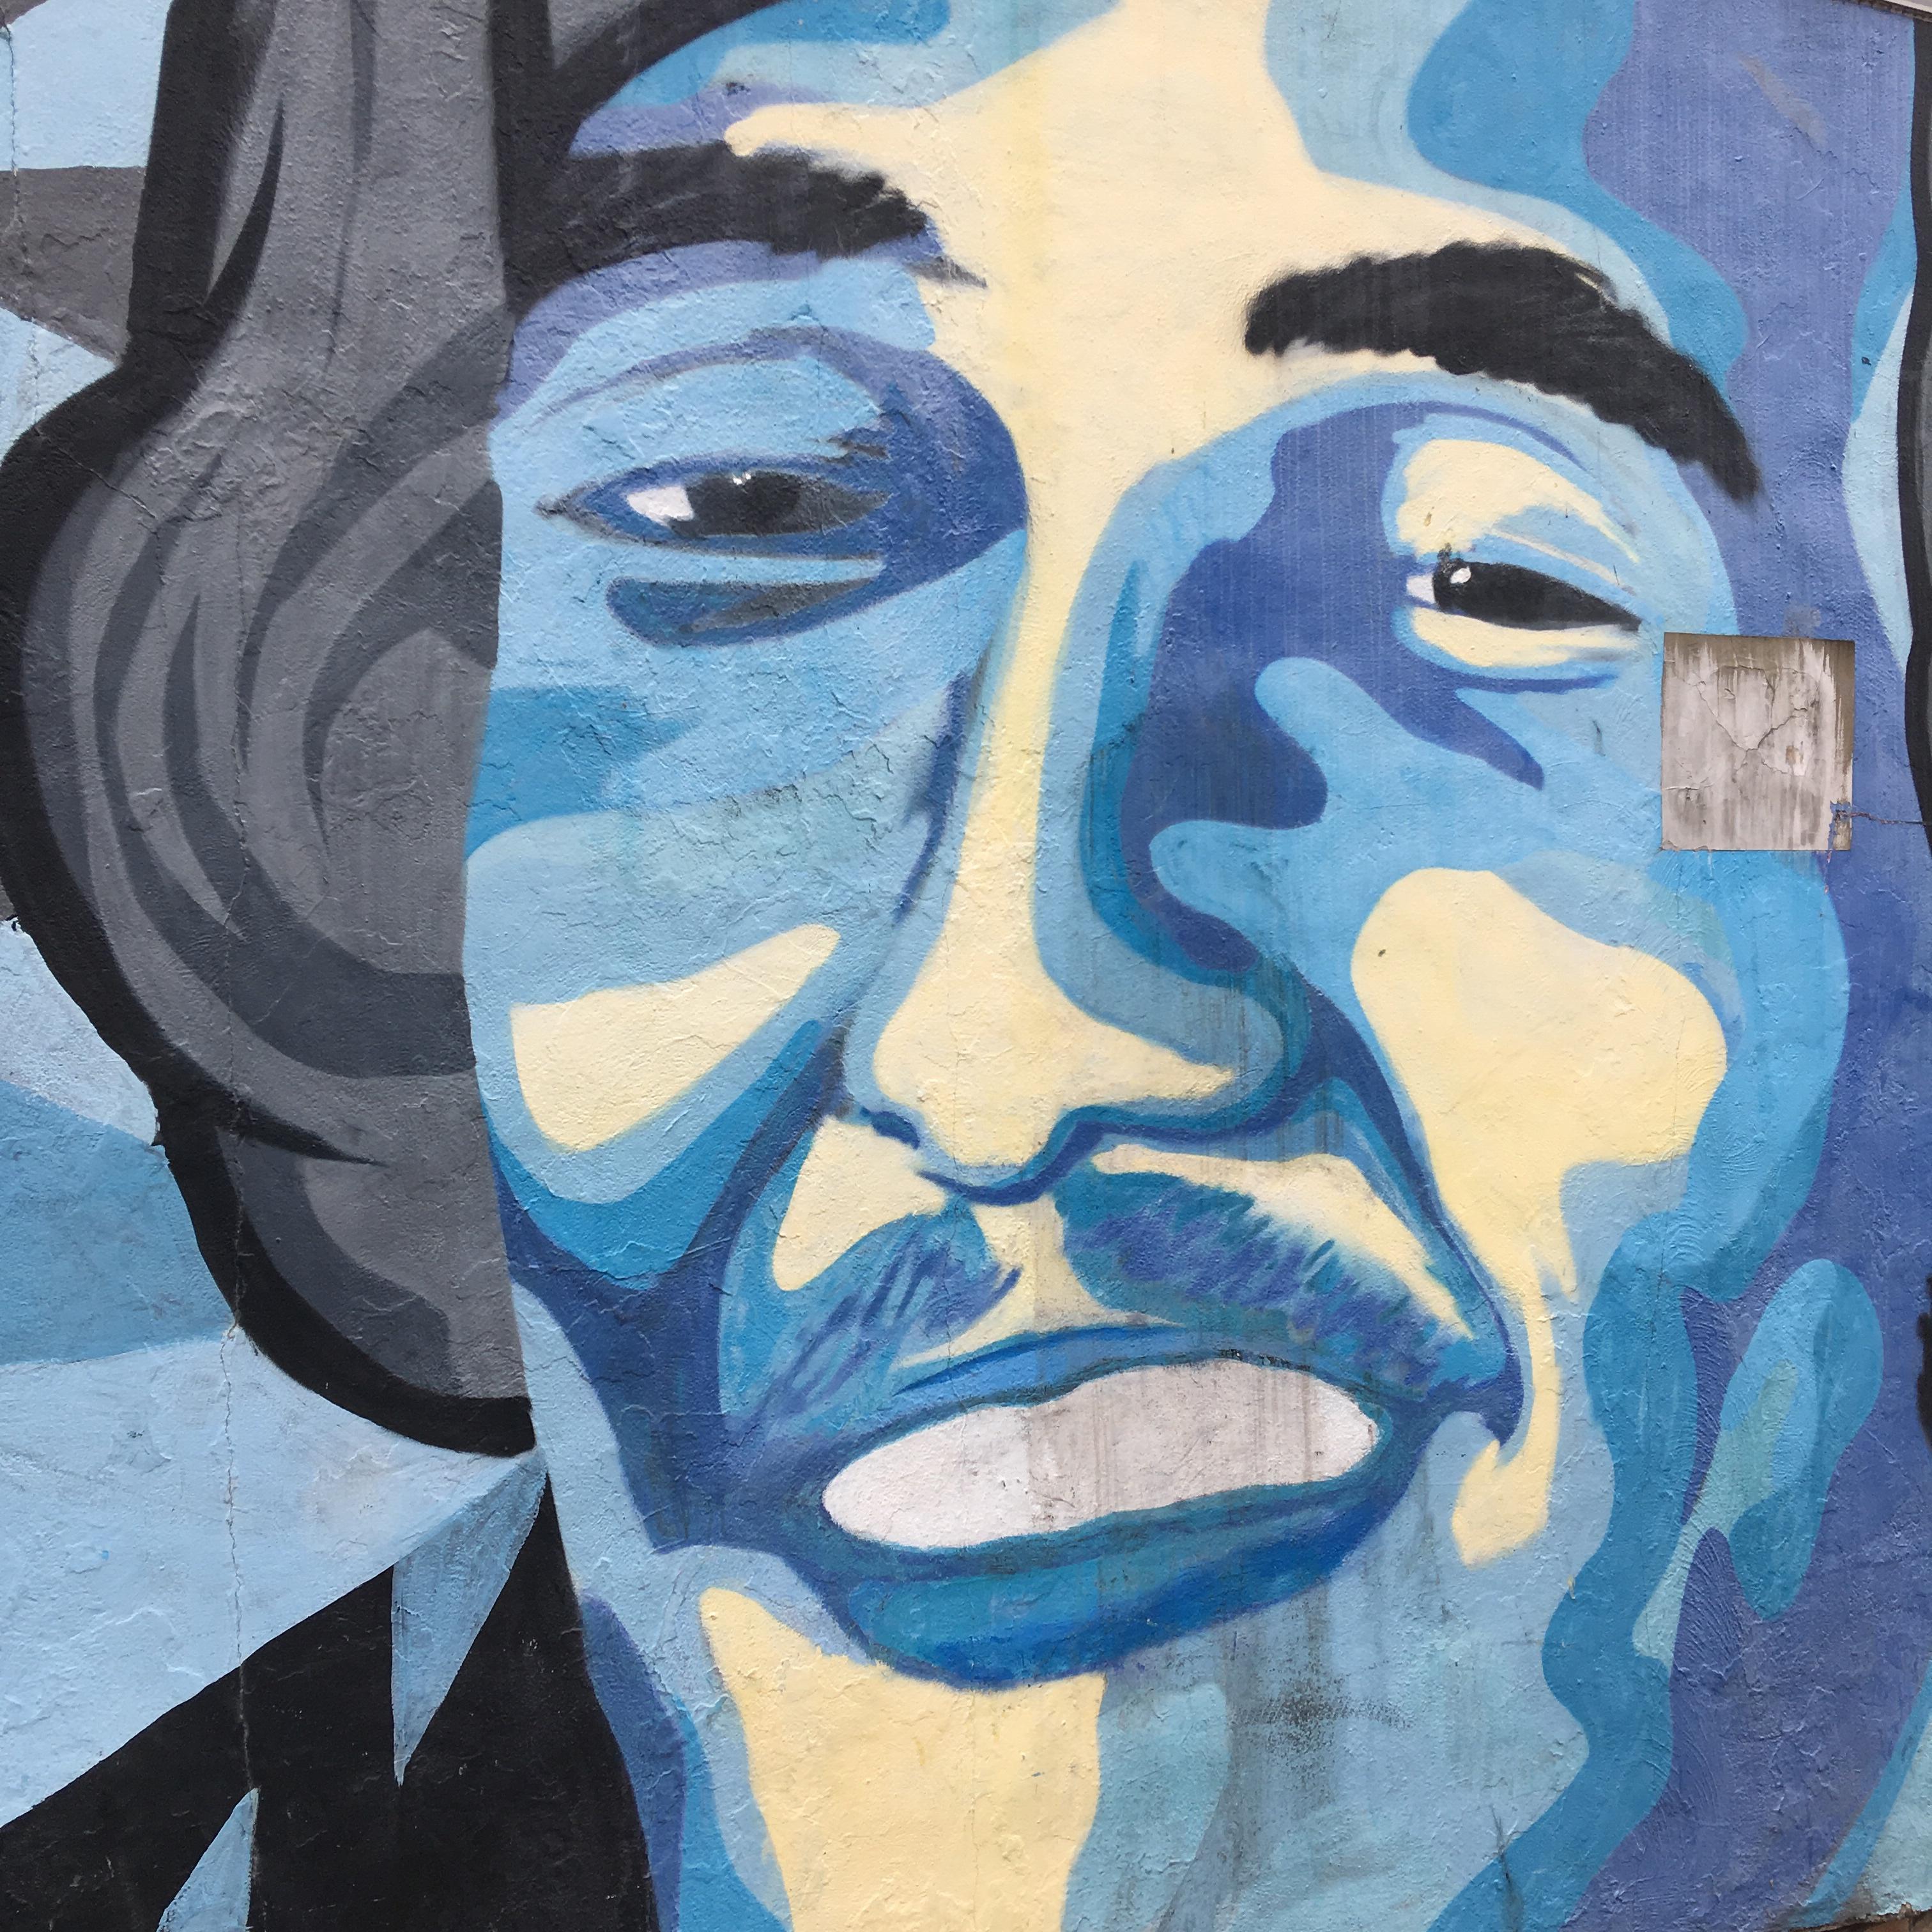 matthew-mcconaughey-austin-street-art